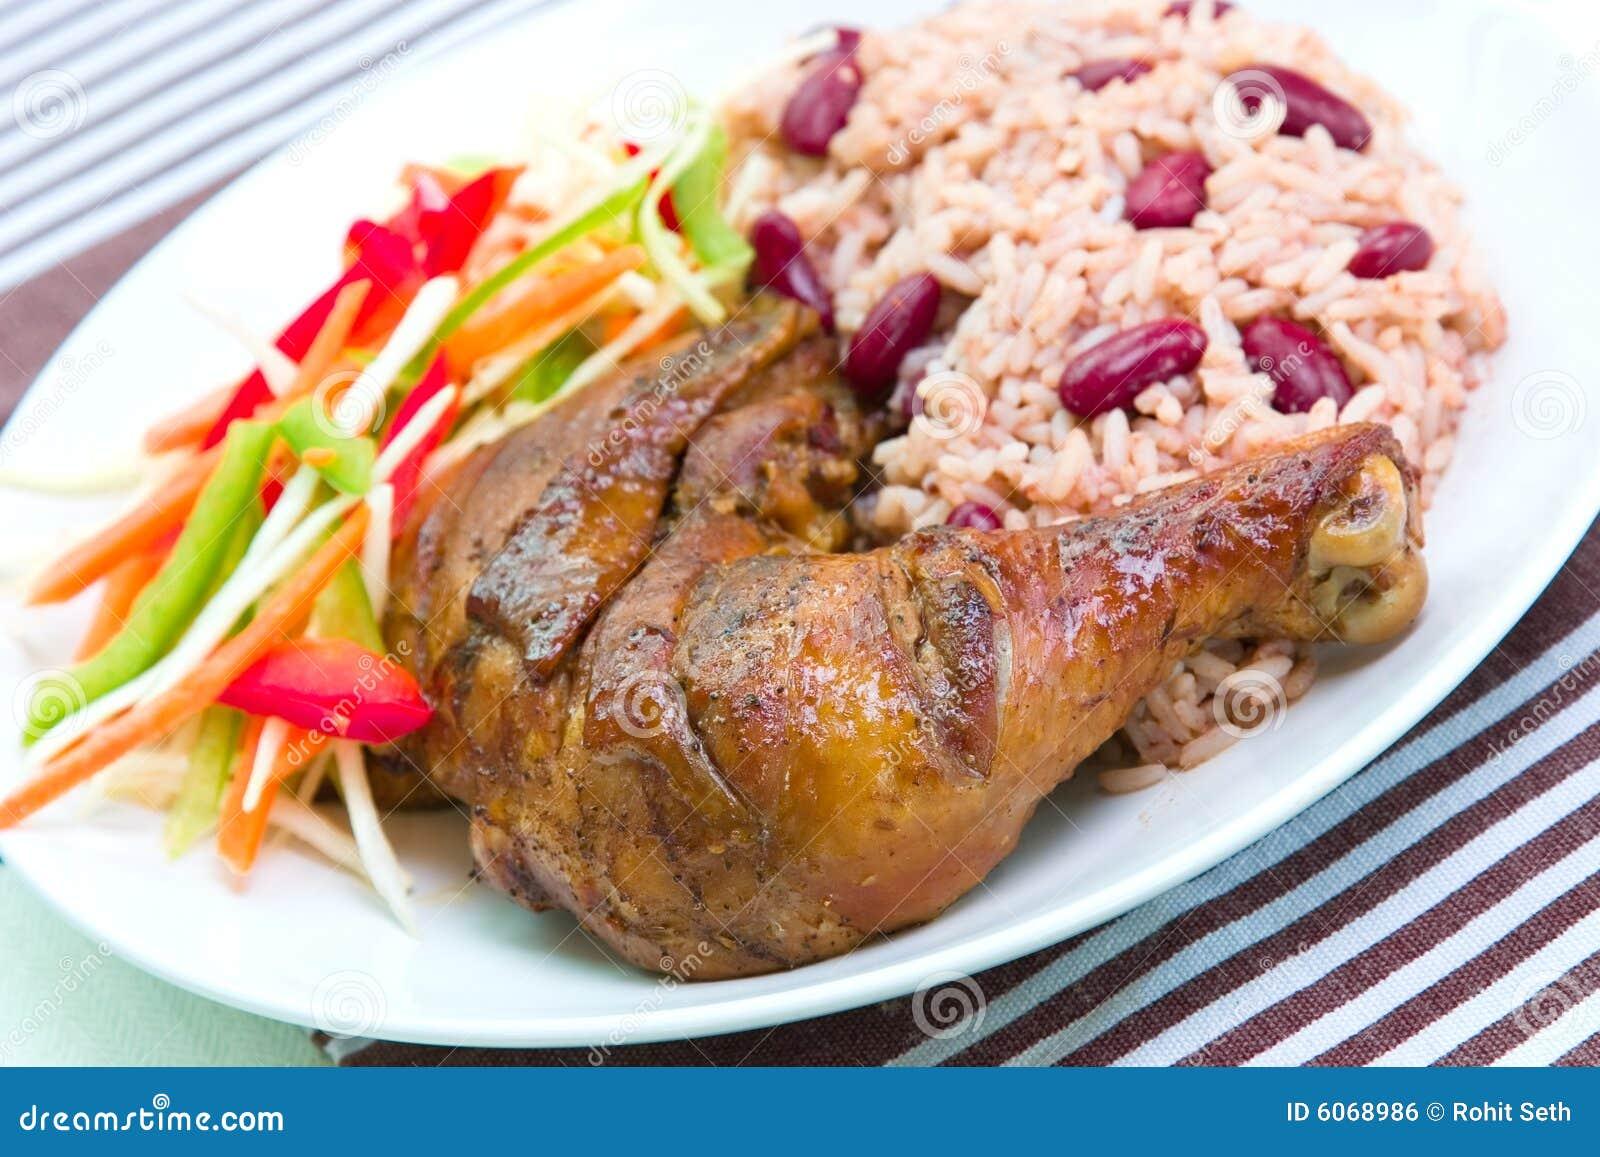 Chicken, Caribbean-Style